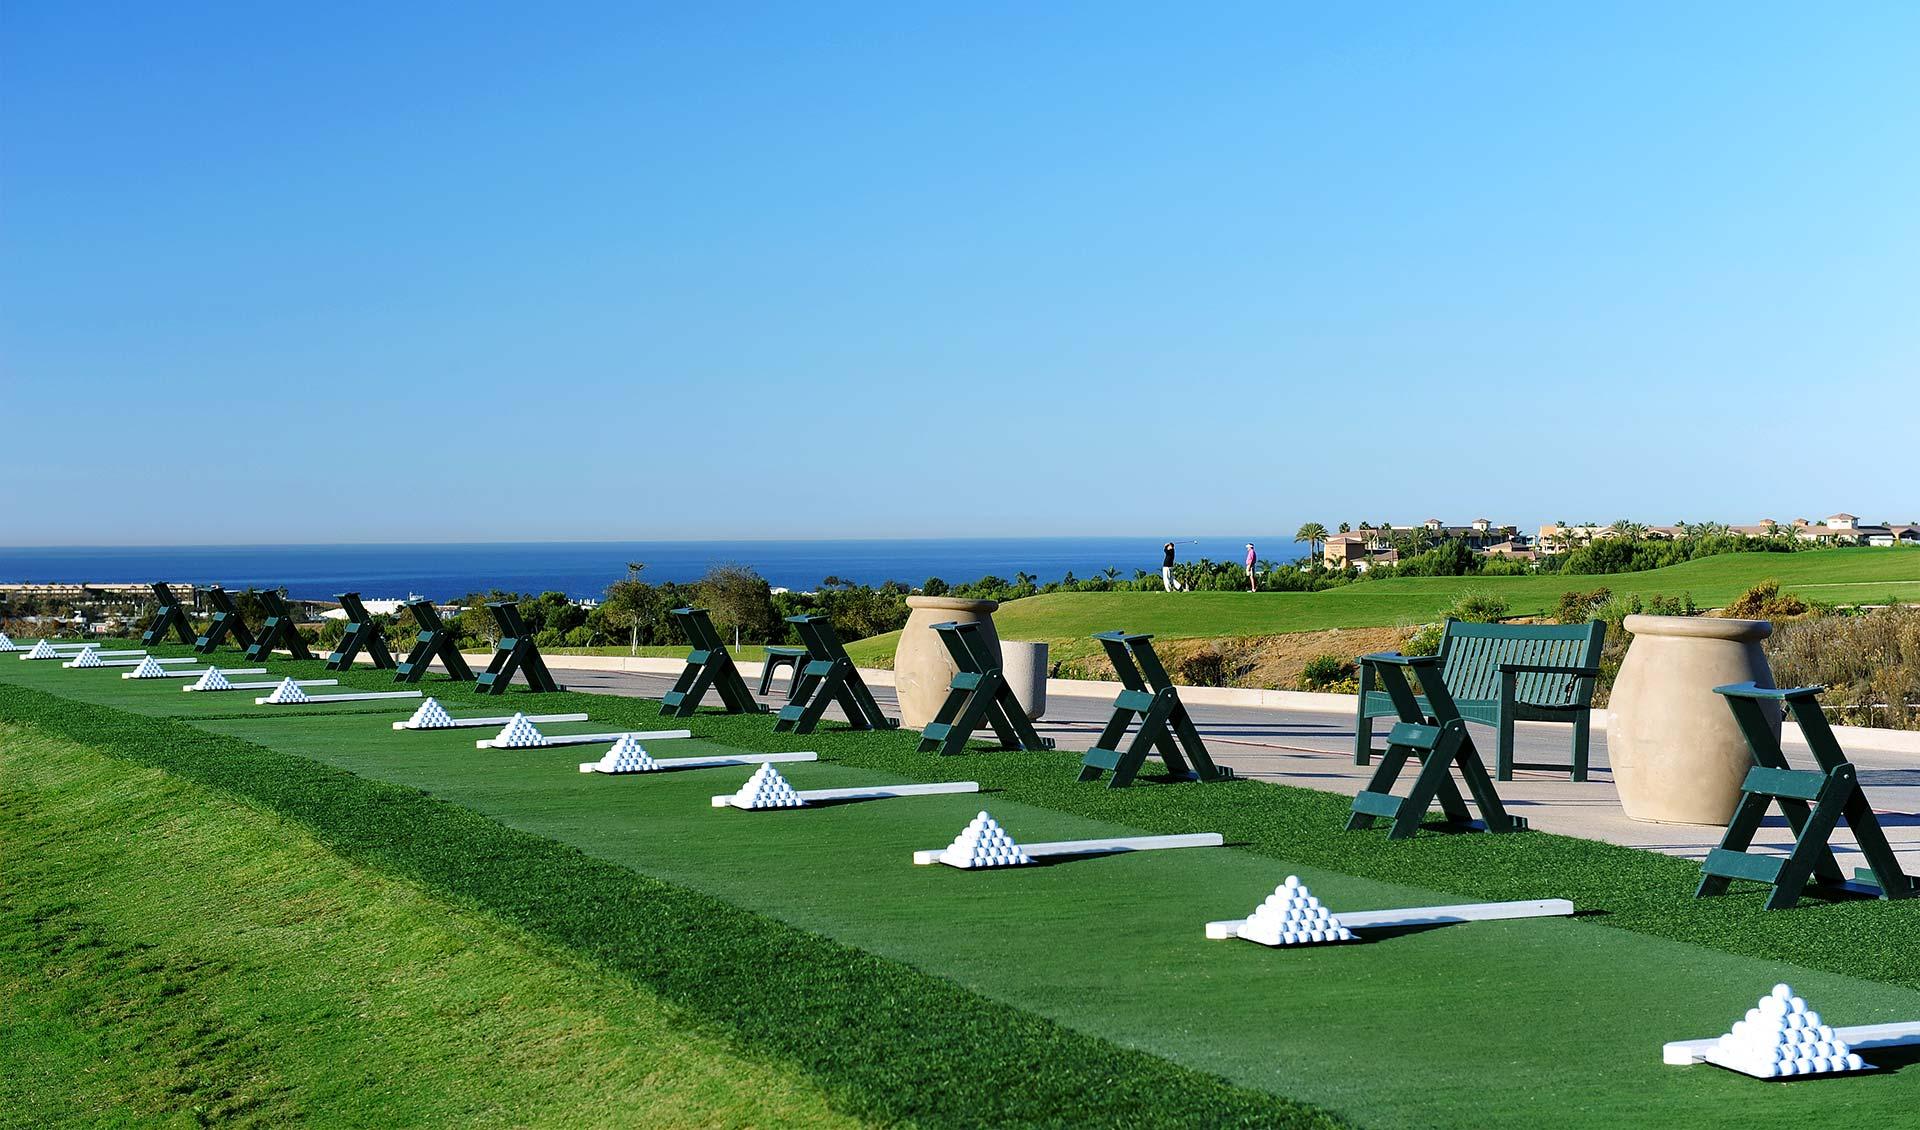 San Diego Golf Courses | Carlsbad Golf | Crossings at Carlsbad